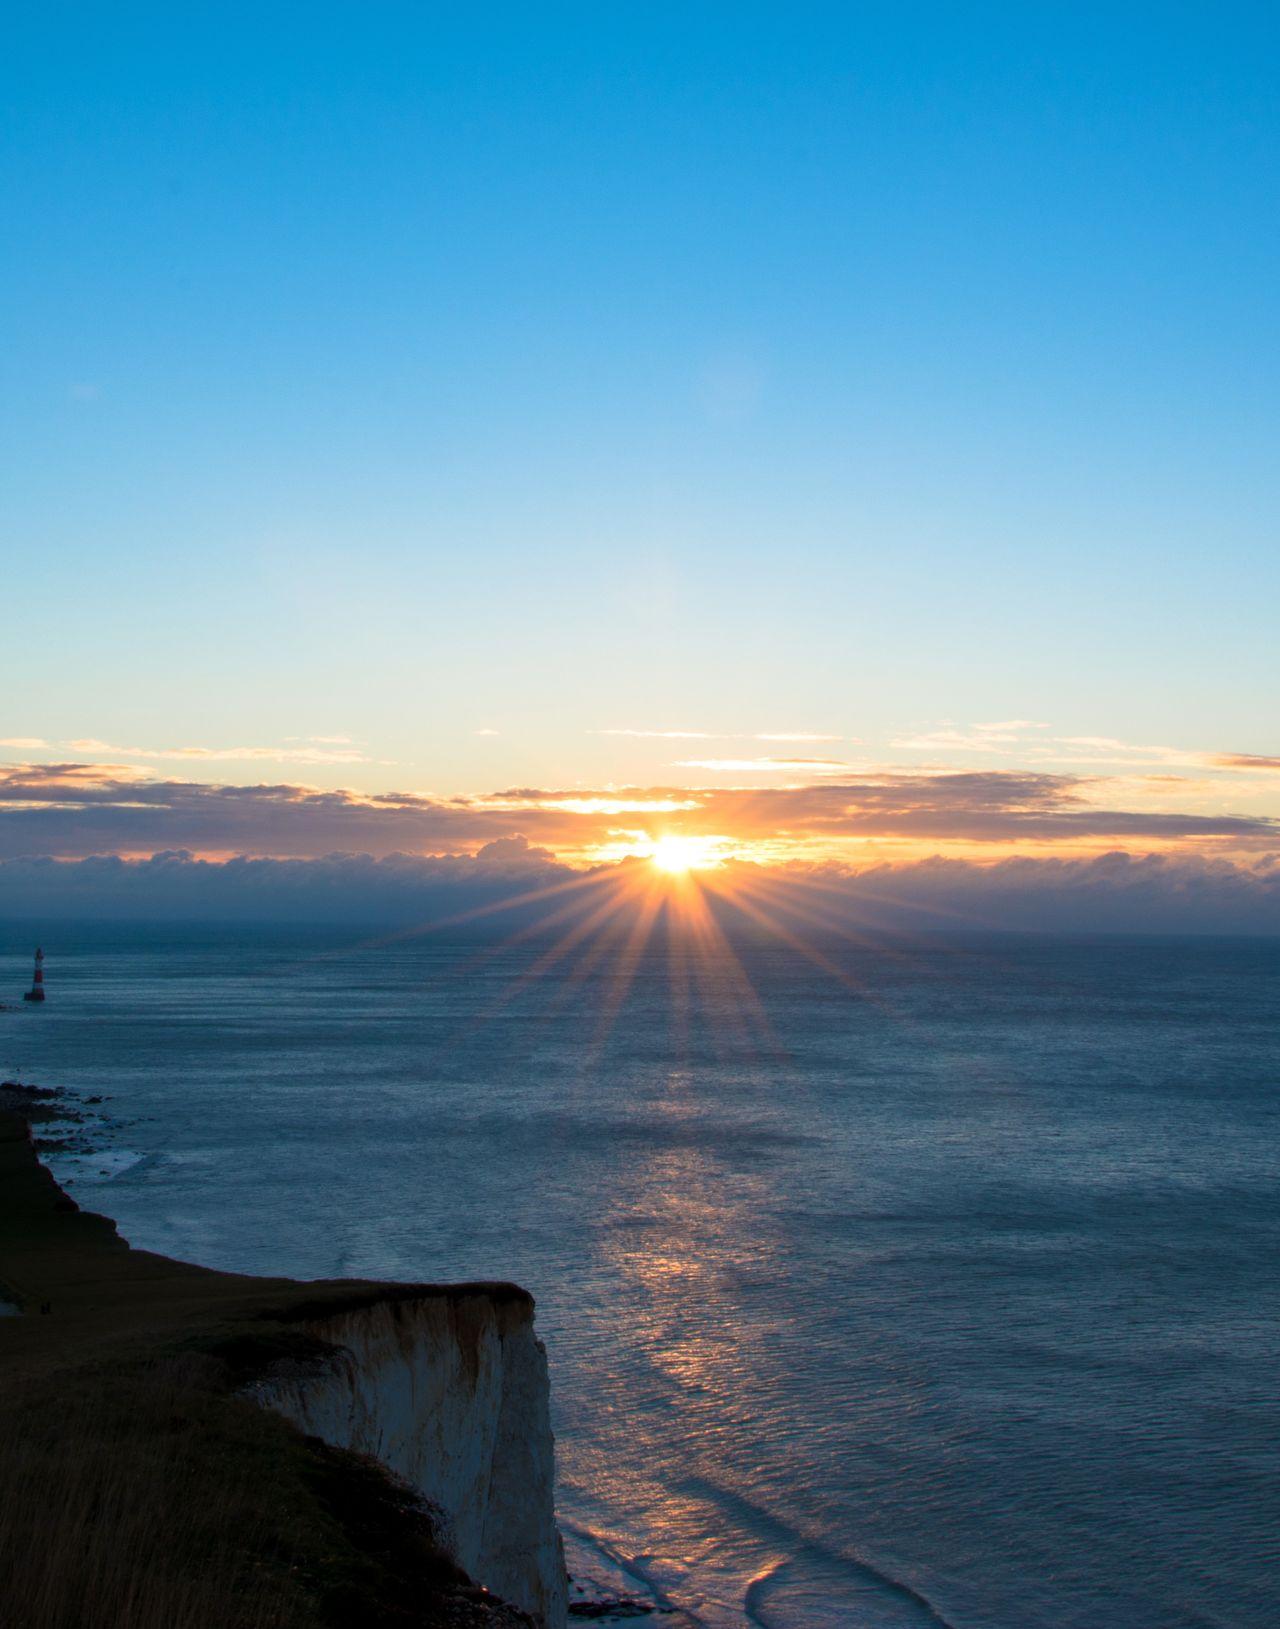 Sunburst. Dawn Of A New Day Sunrise Beachy Head Lighthouse Cliff Sea And Sky Landscape_Collection Blue Sky